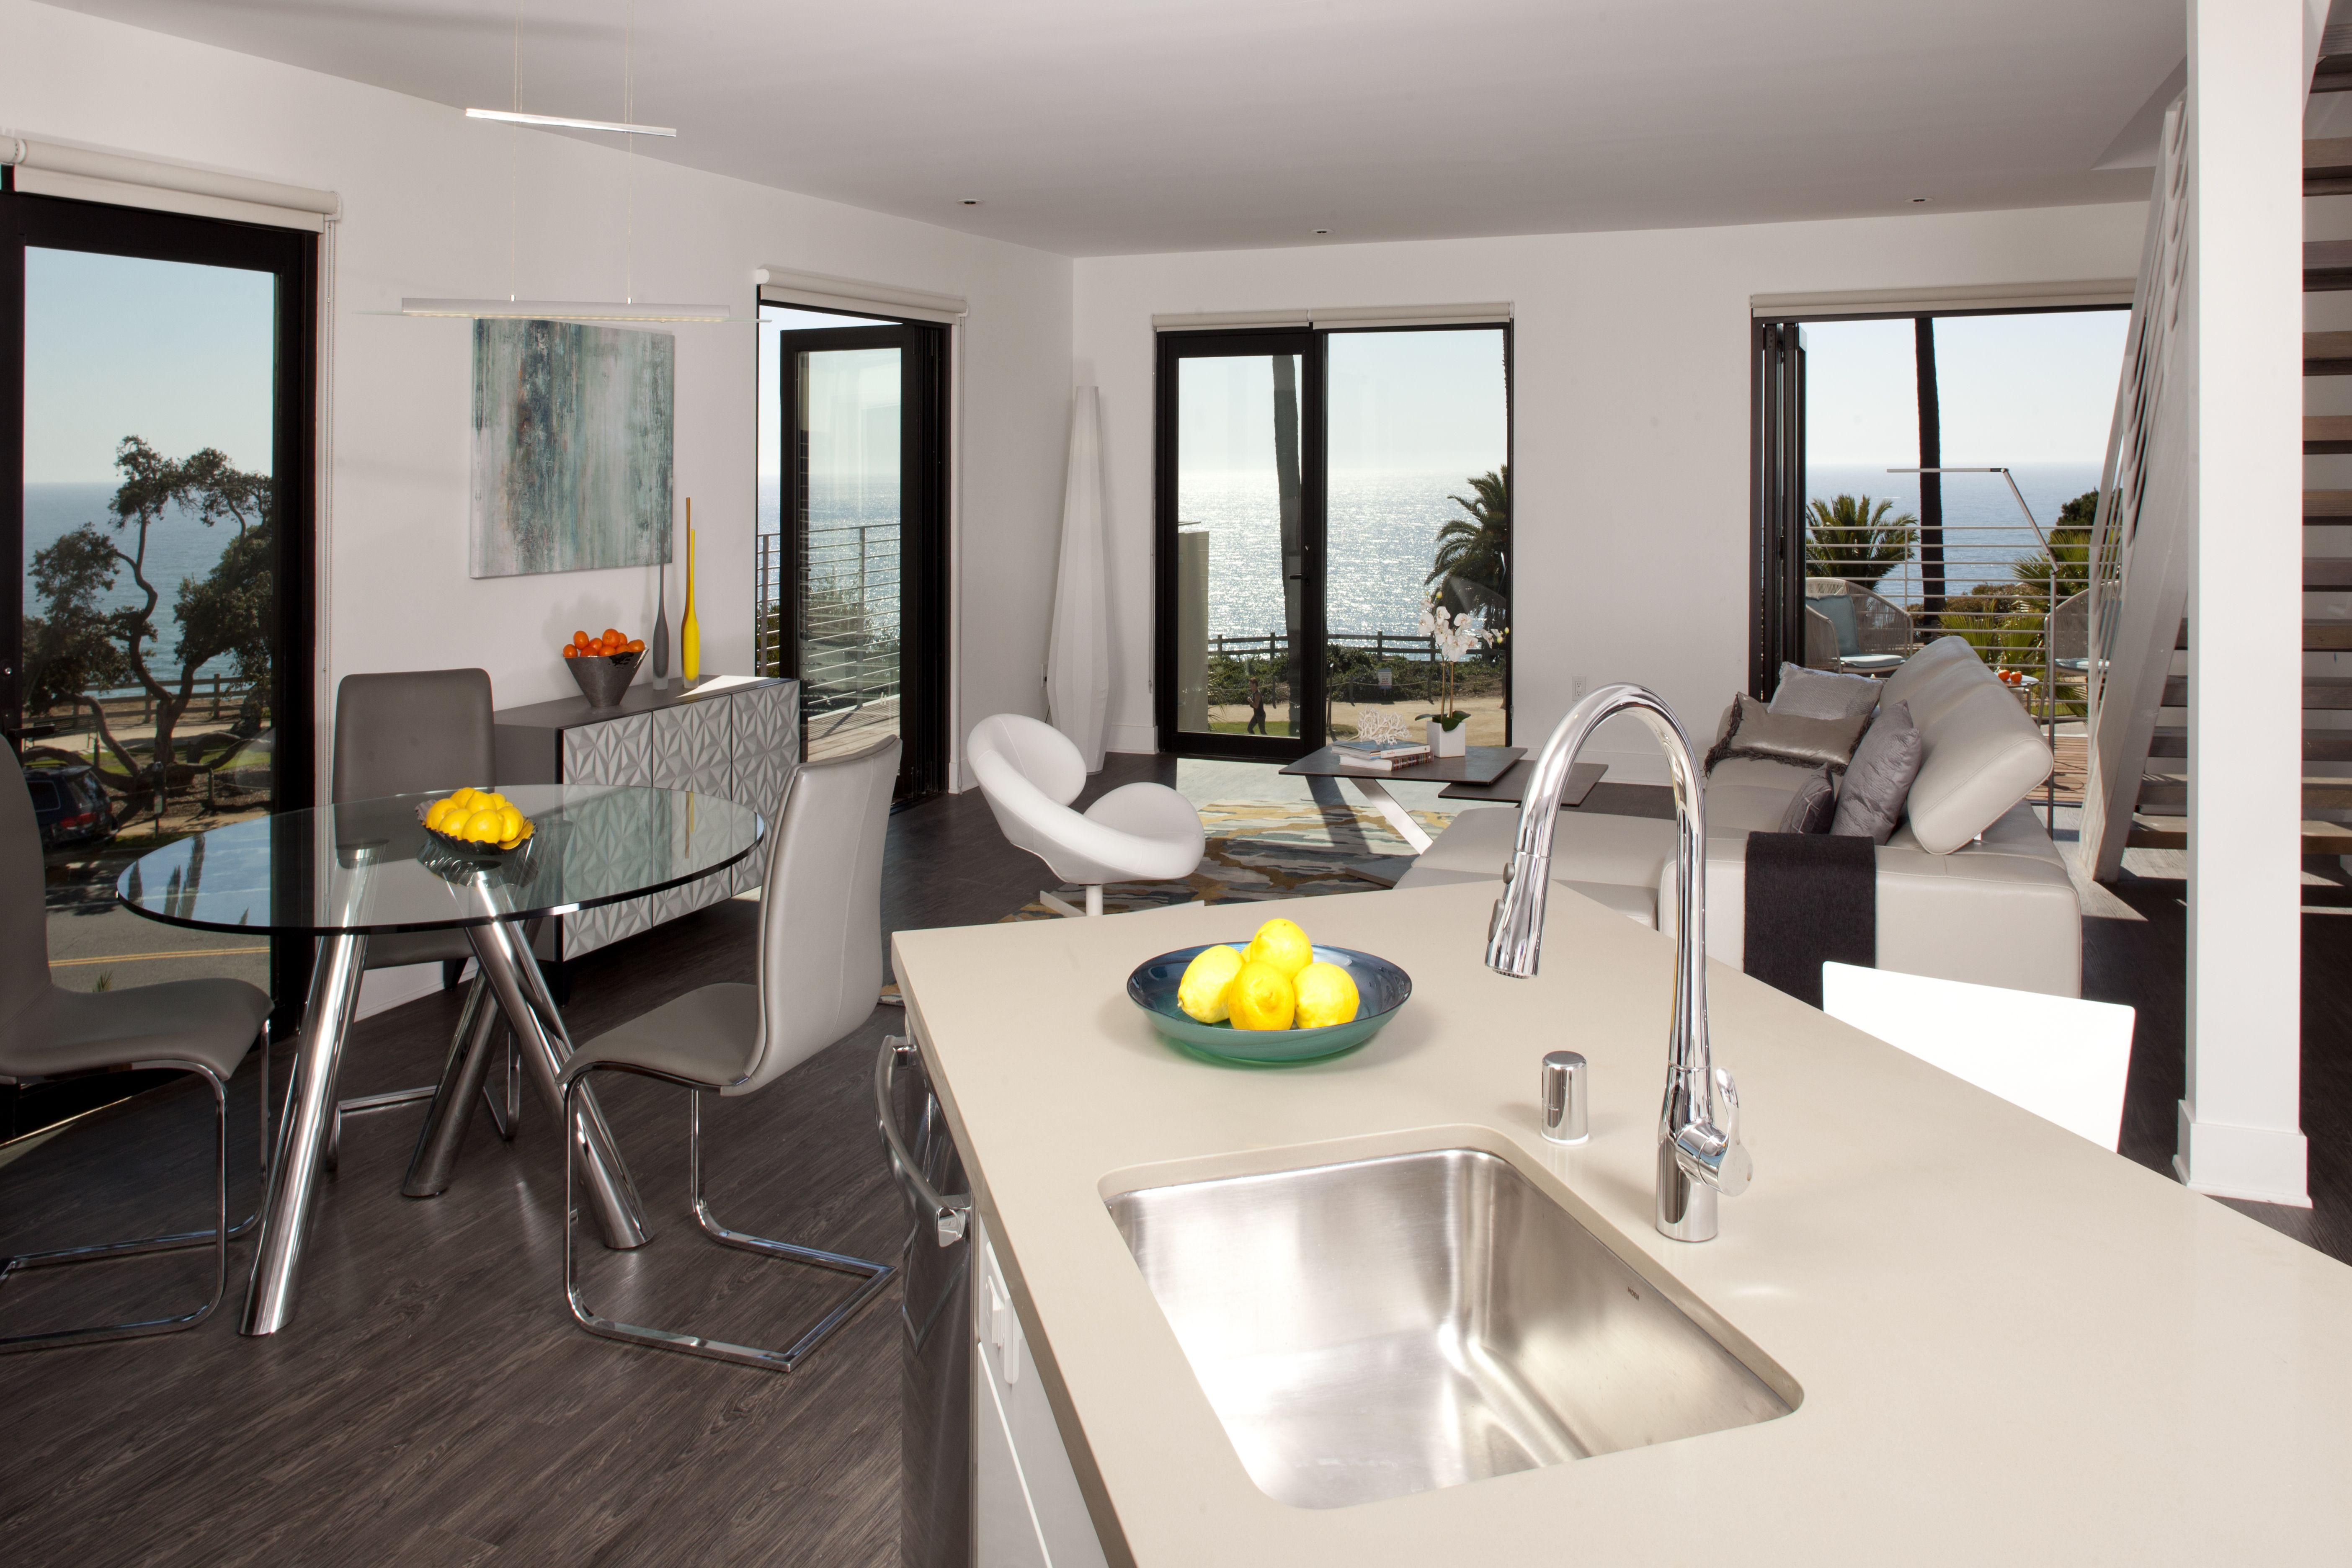 301ocean Com Luxury Ocean View Apartments In Santa Monica Ca 310 907 7587 Ocean View Apartment Apartment View Luxury Apartments